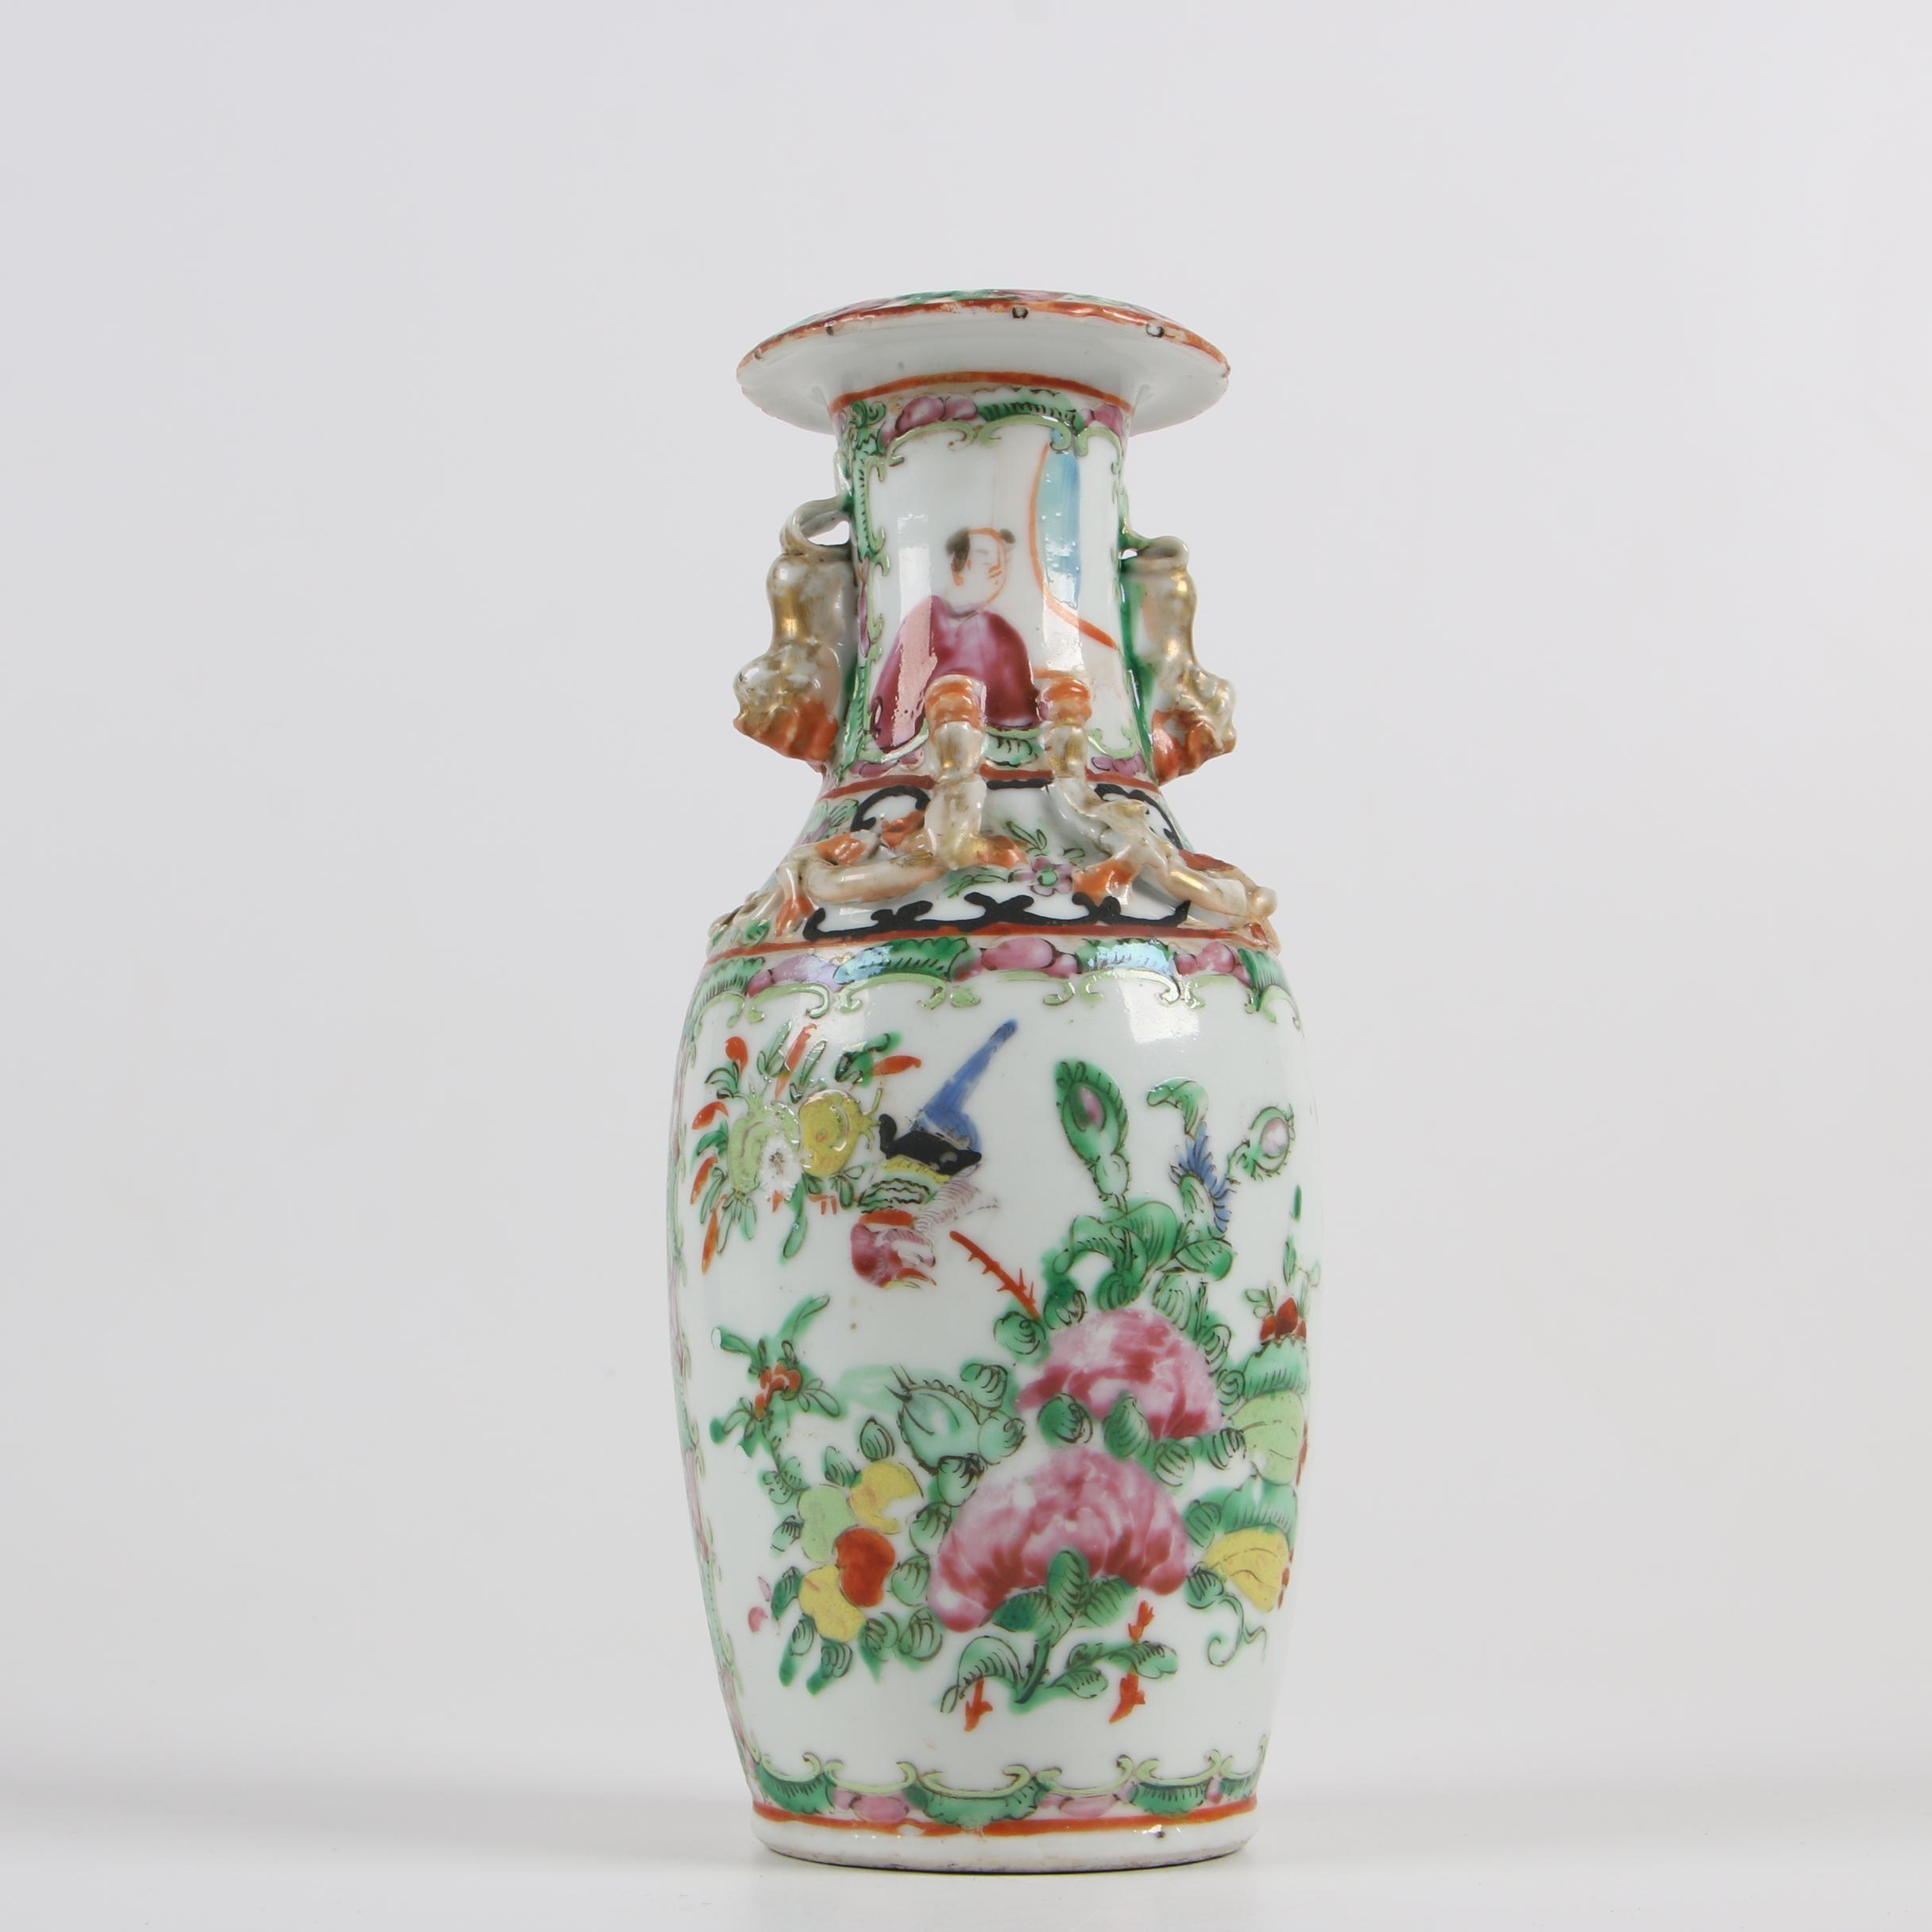 Chinese Rose Medallion Porcelain Vase with Guardian Lion Handles